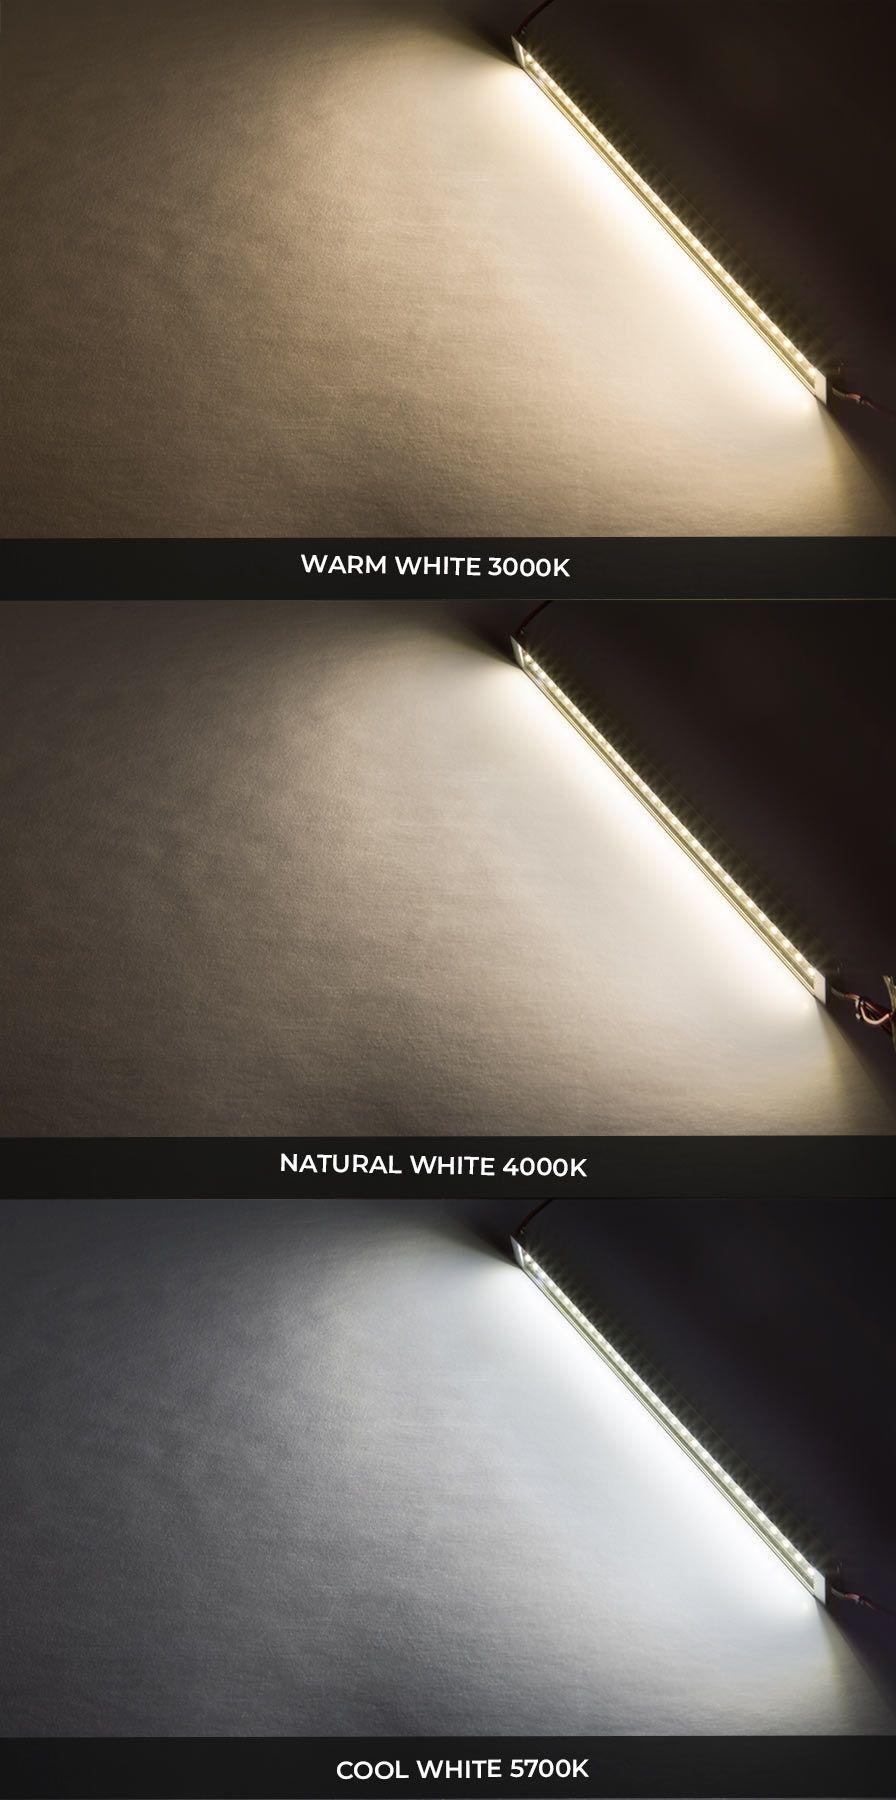 Waterproof Linear Led Light Bar Fixture 390 Lumens In 2020 Bar Lighting Led Lights Linear Lighting